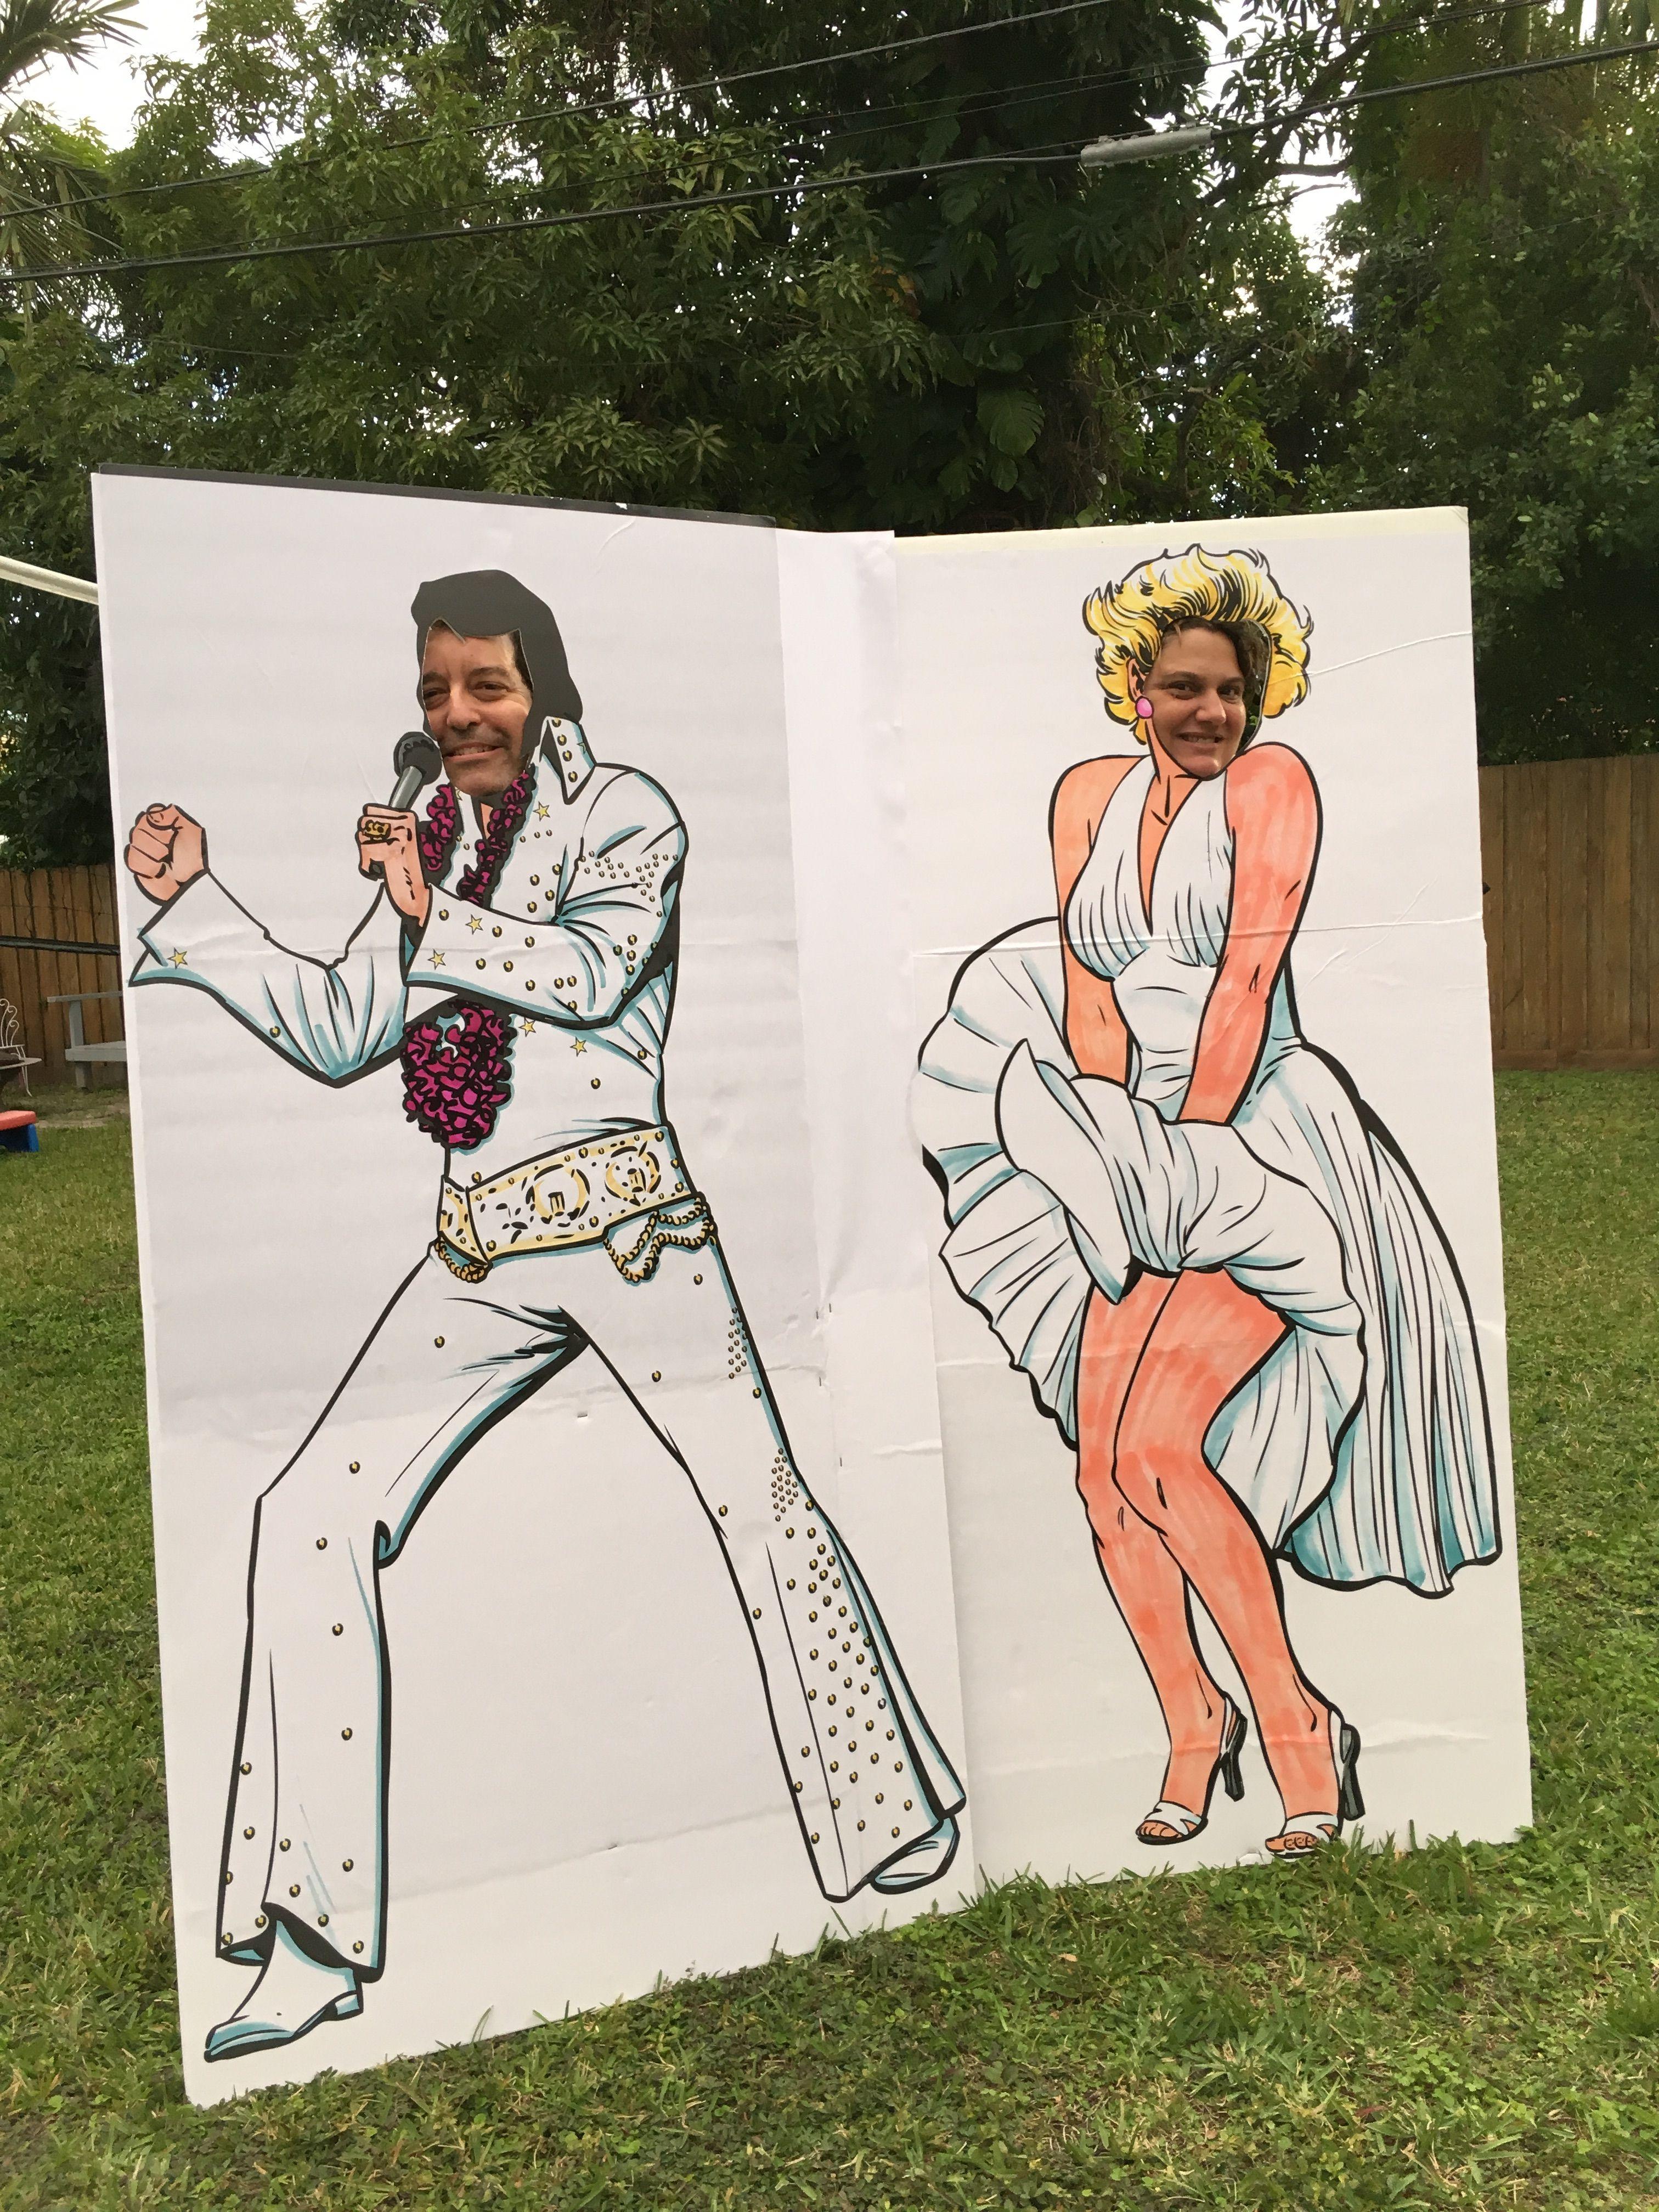 Star Cutouts Cut Out Of Elvis Vegas Alternative Image Lifesize Cardboard Cut